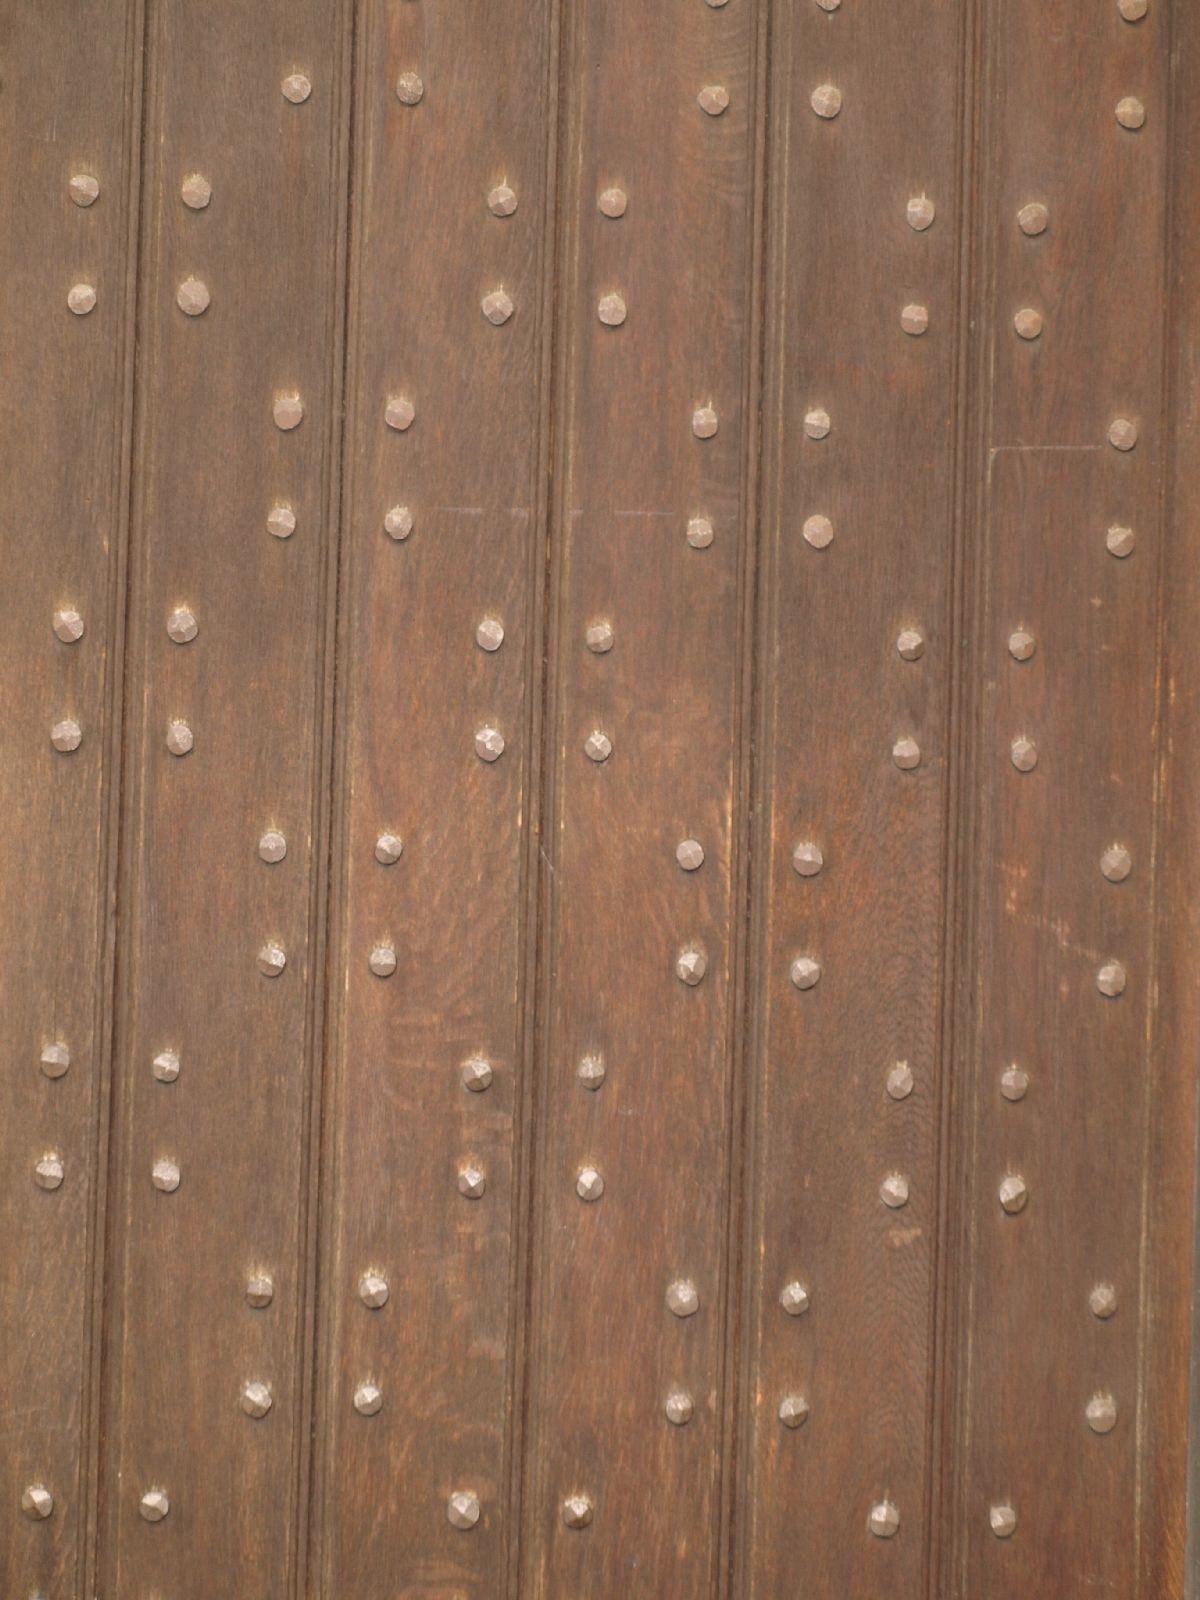 Wood_Texture_A_P4110637